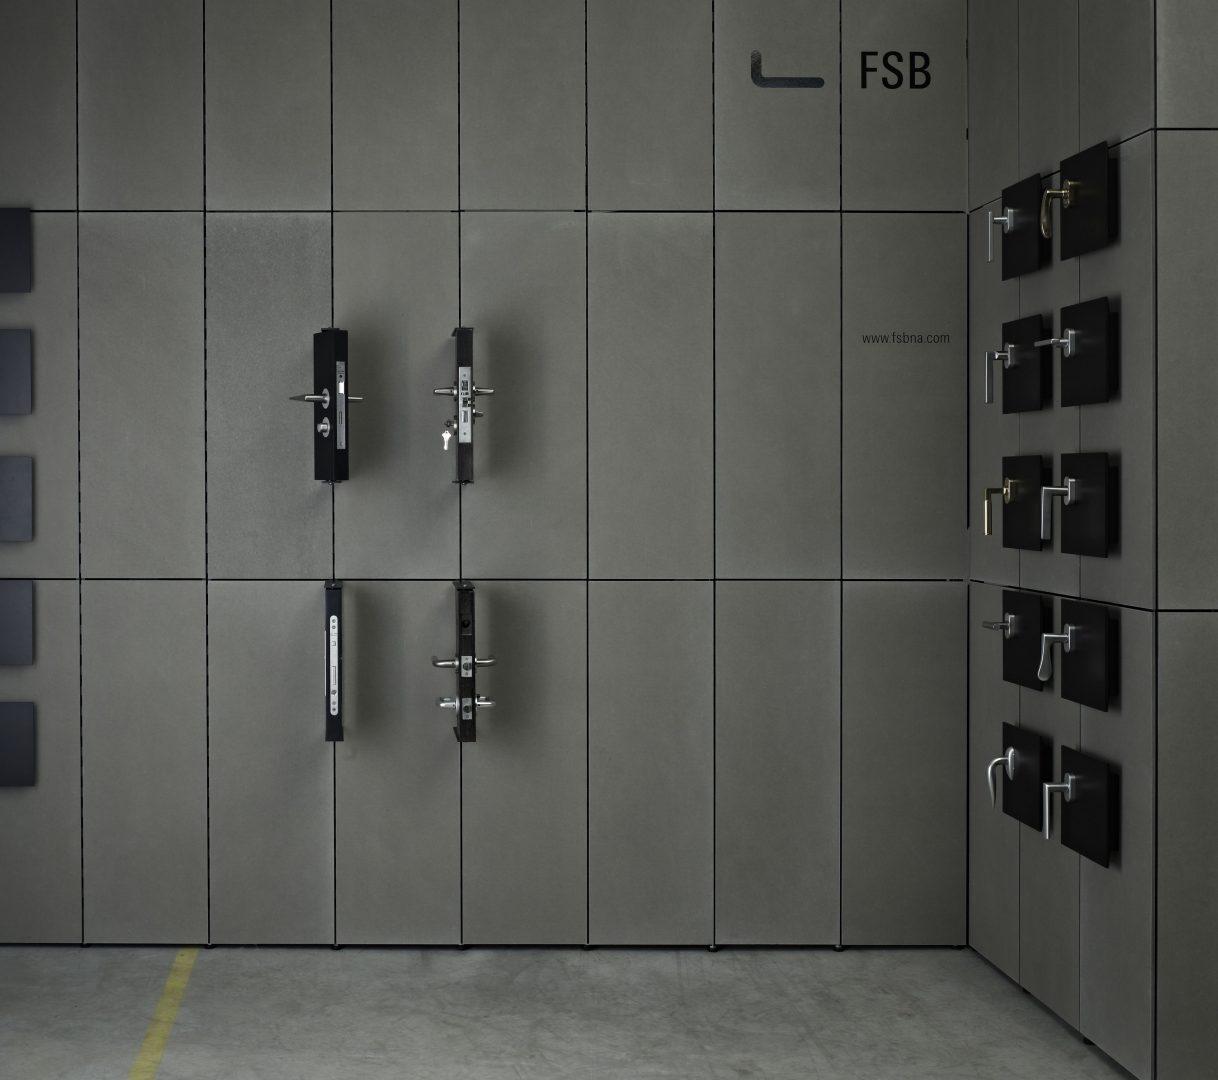 atelier-522-FSB-8